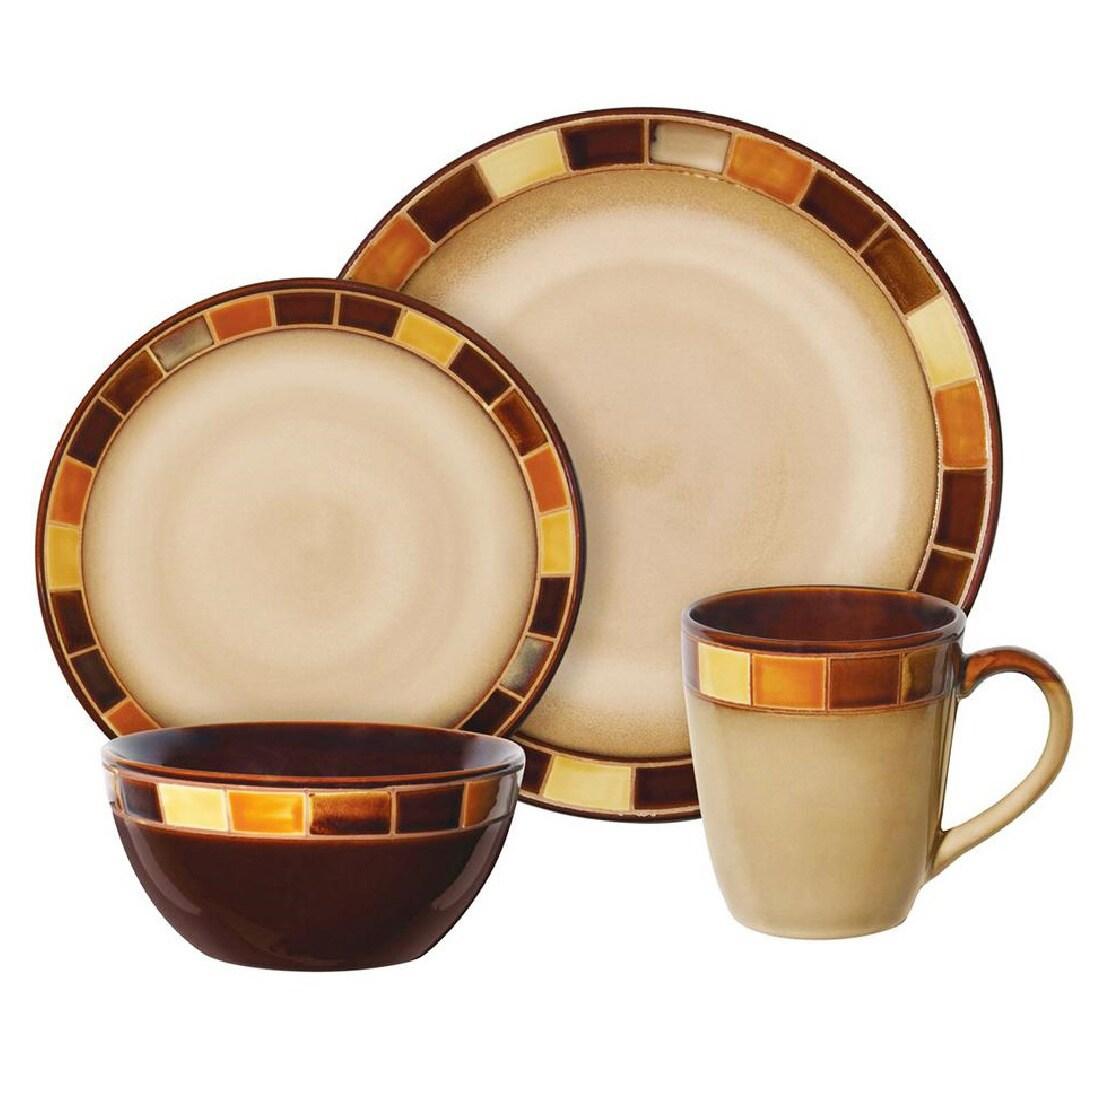 Casa Estebana 16-piece Dinnerware Set - Free Shipping Today - Overstock - 18002271  sc 1 st  Overstock & Casa Estebana 16-piece Dinnerware Set - Free Shipping Today ...